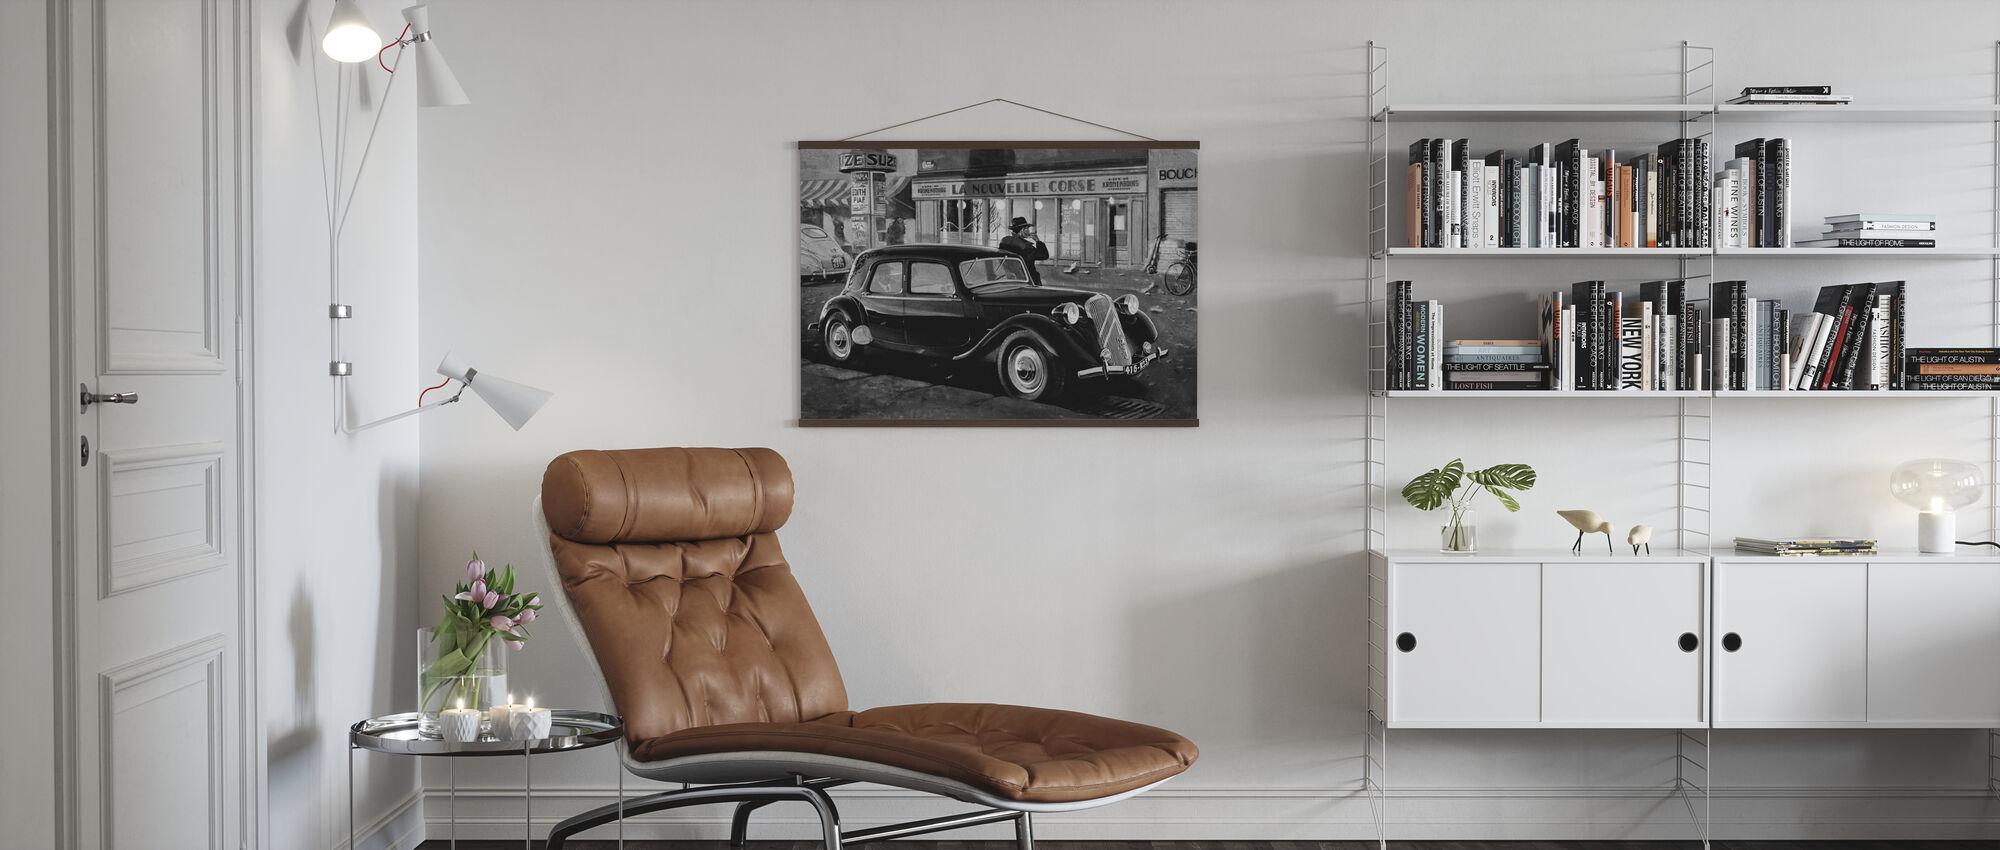 B15 in Paris BW - Poster - Living Room